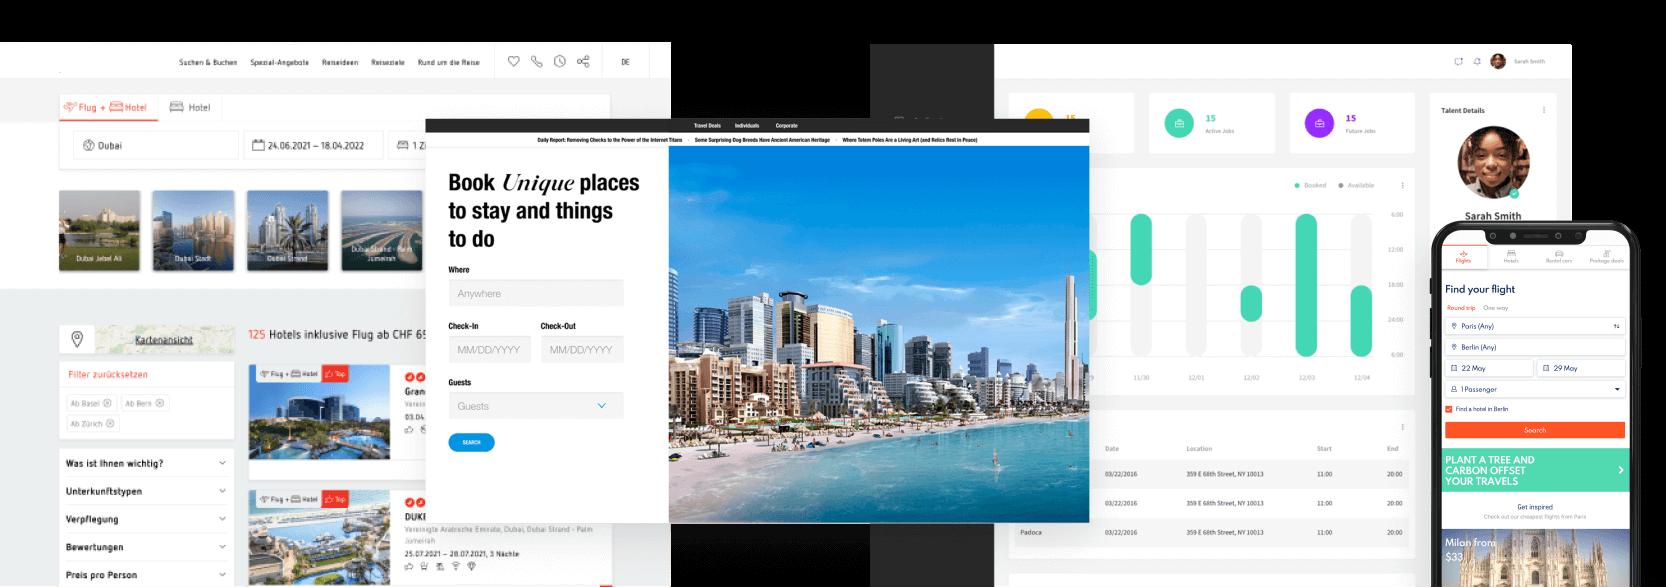 Bespoke-Travel-Software